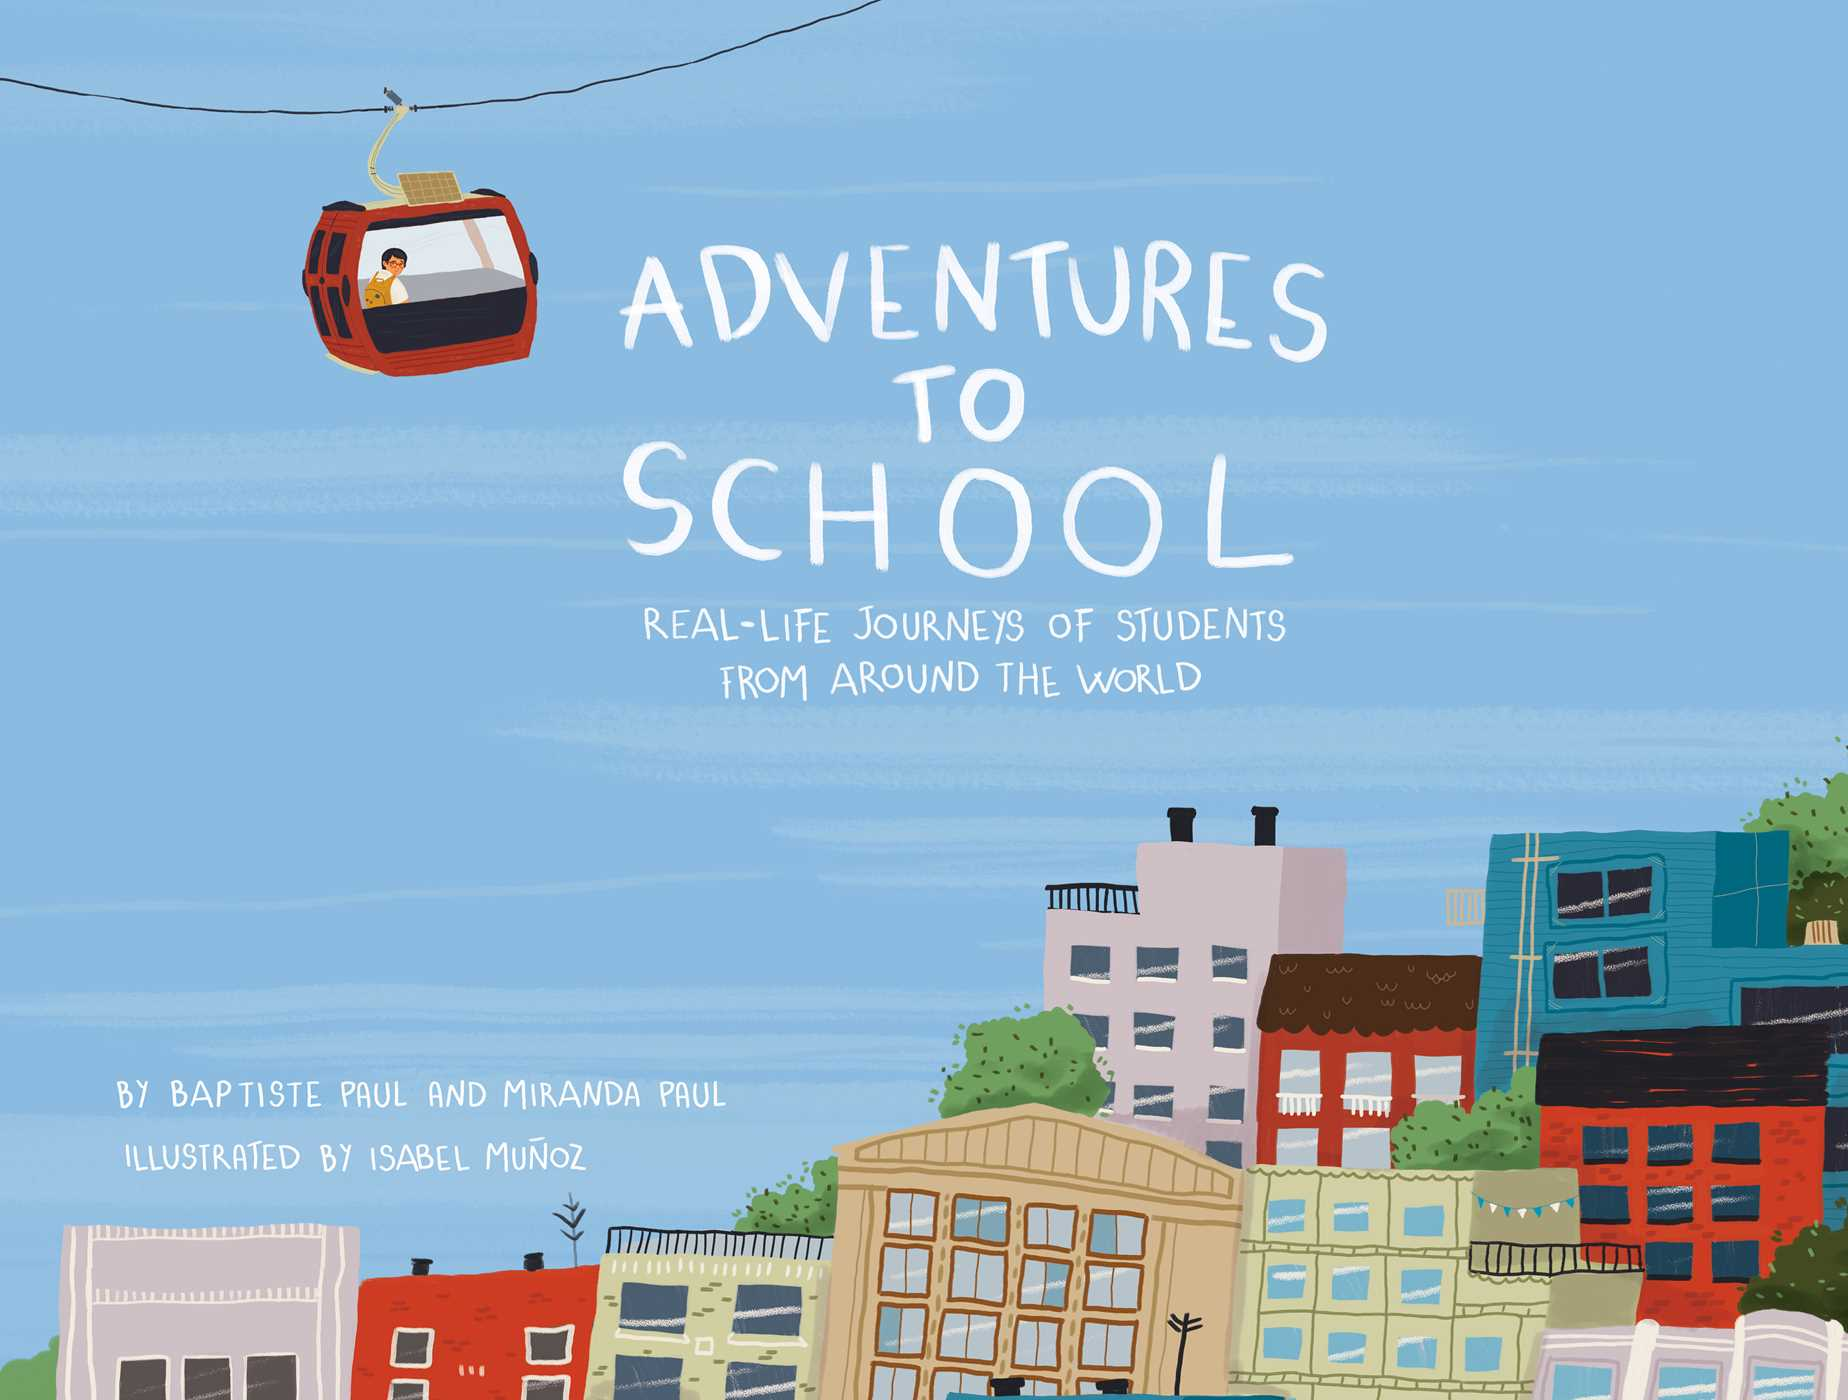 Adventures-to-school-by Miranda Paul And Baptiste Paul 04-30-18